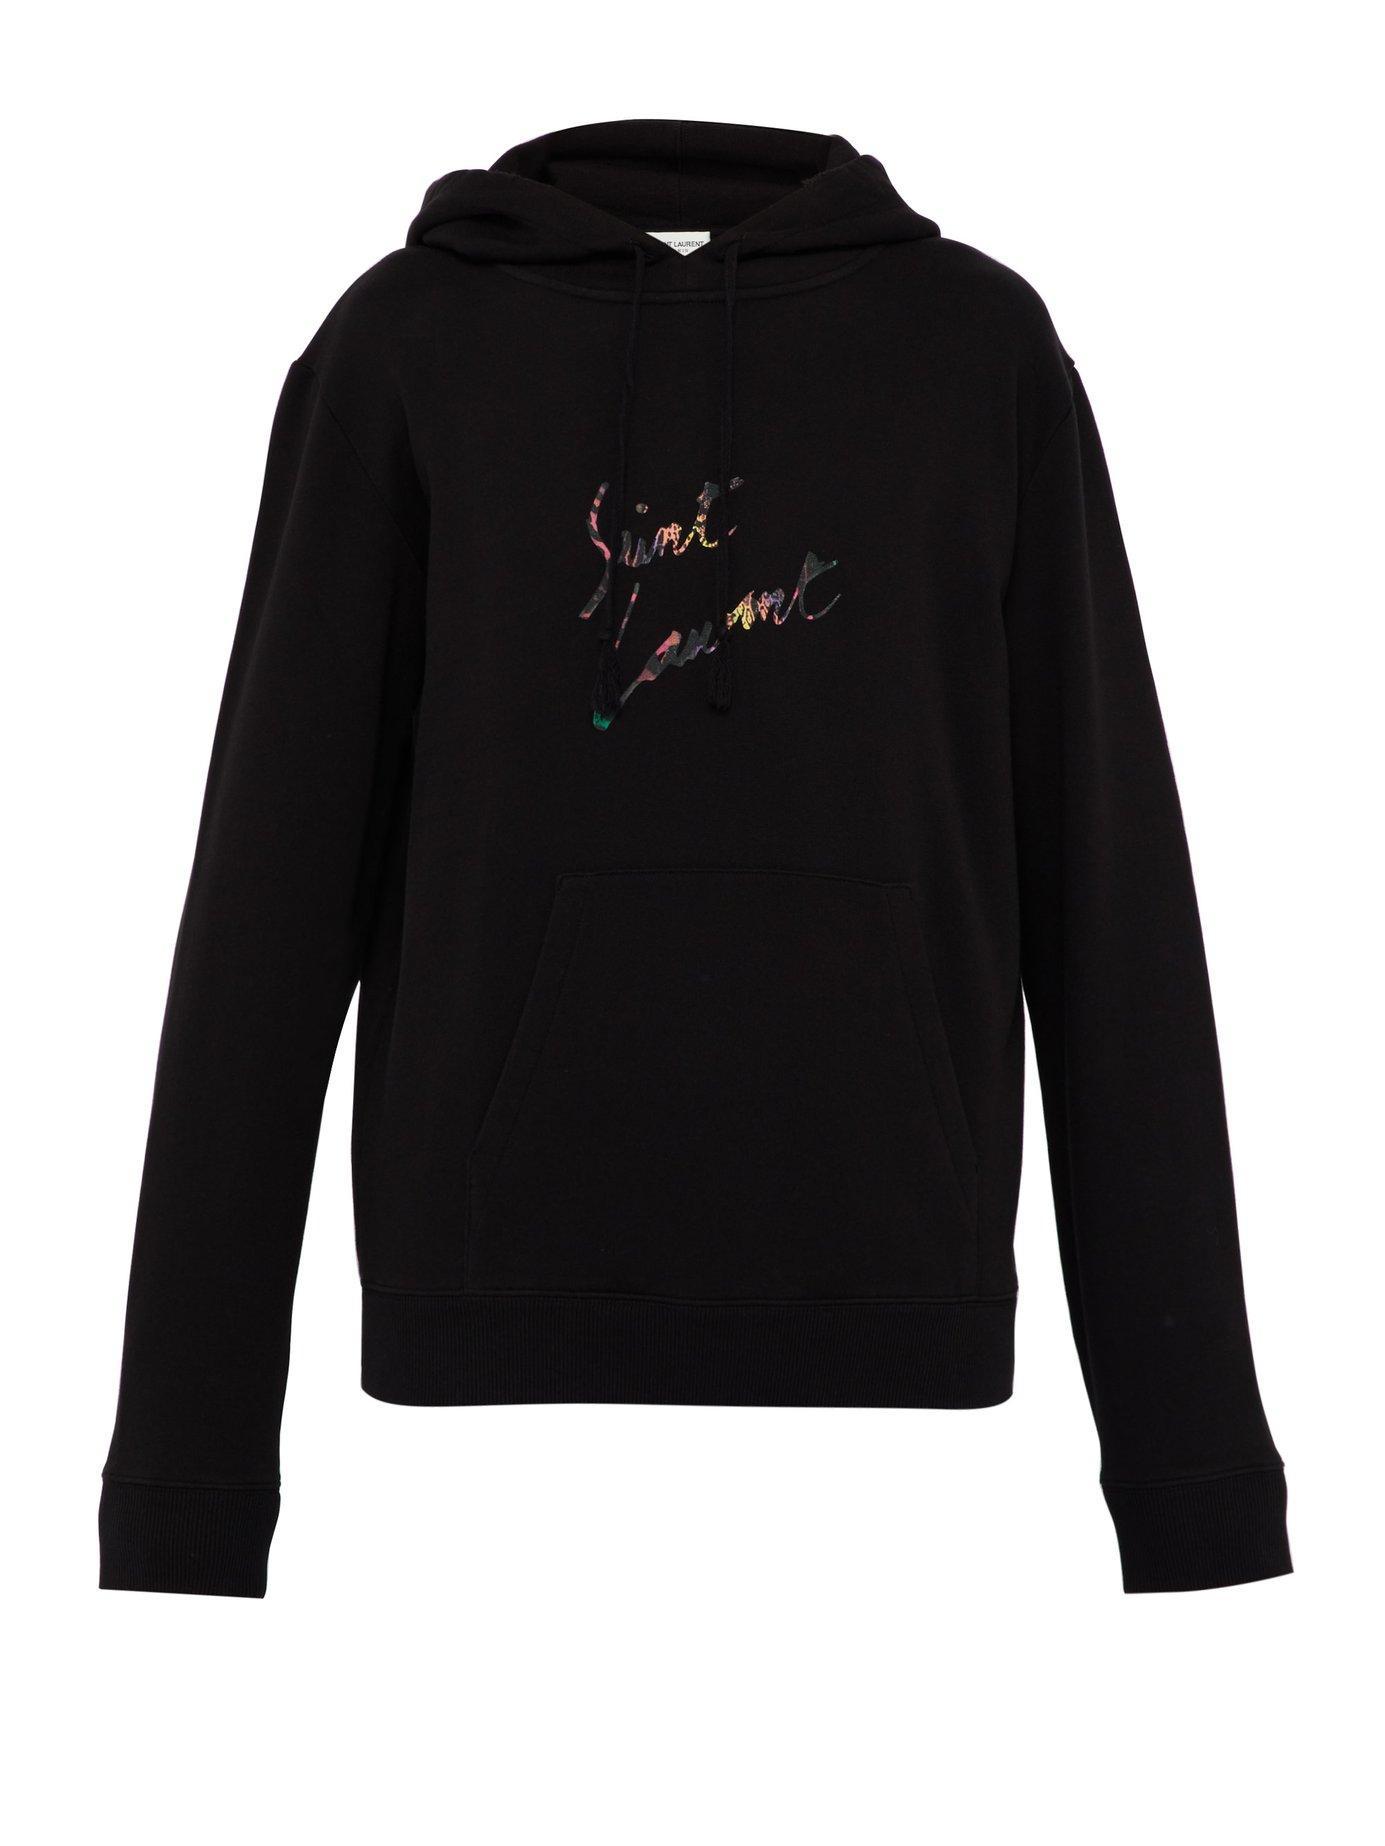 90823b12988 Saint Laurent. Men's Black Destroyed Logo Printed Cotton Hooded Sweatshirt